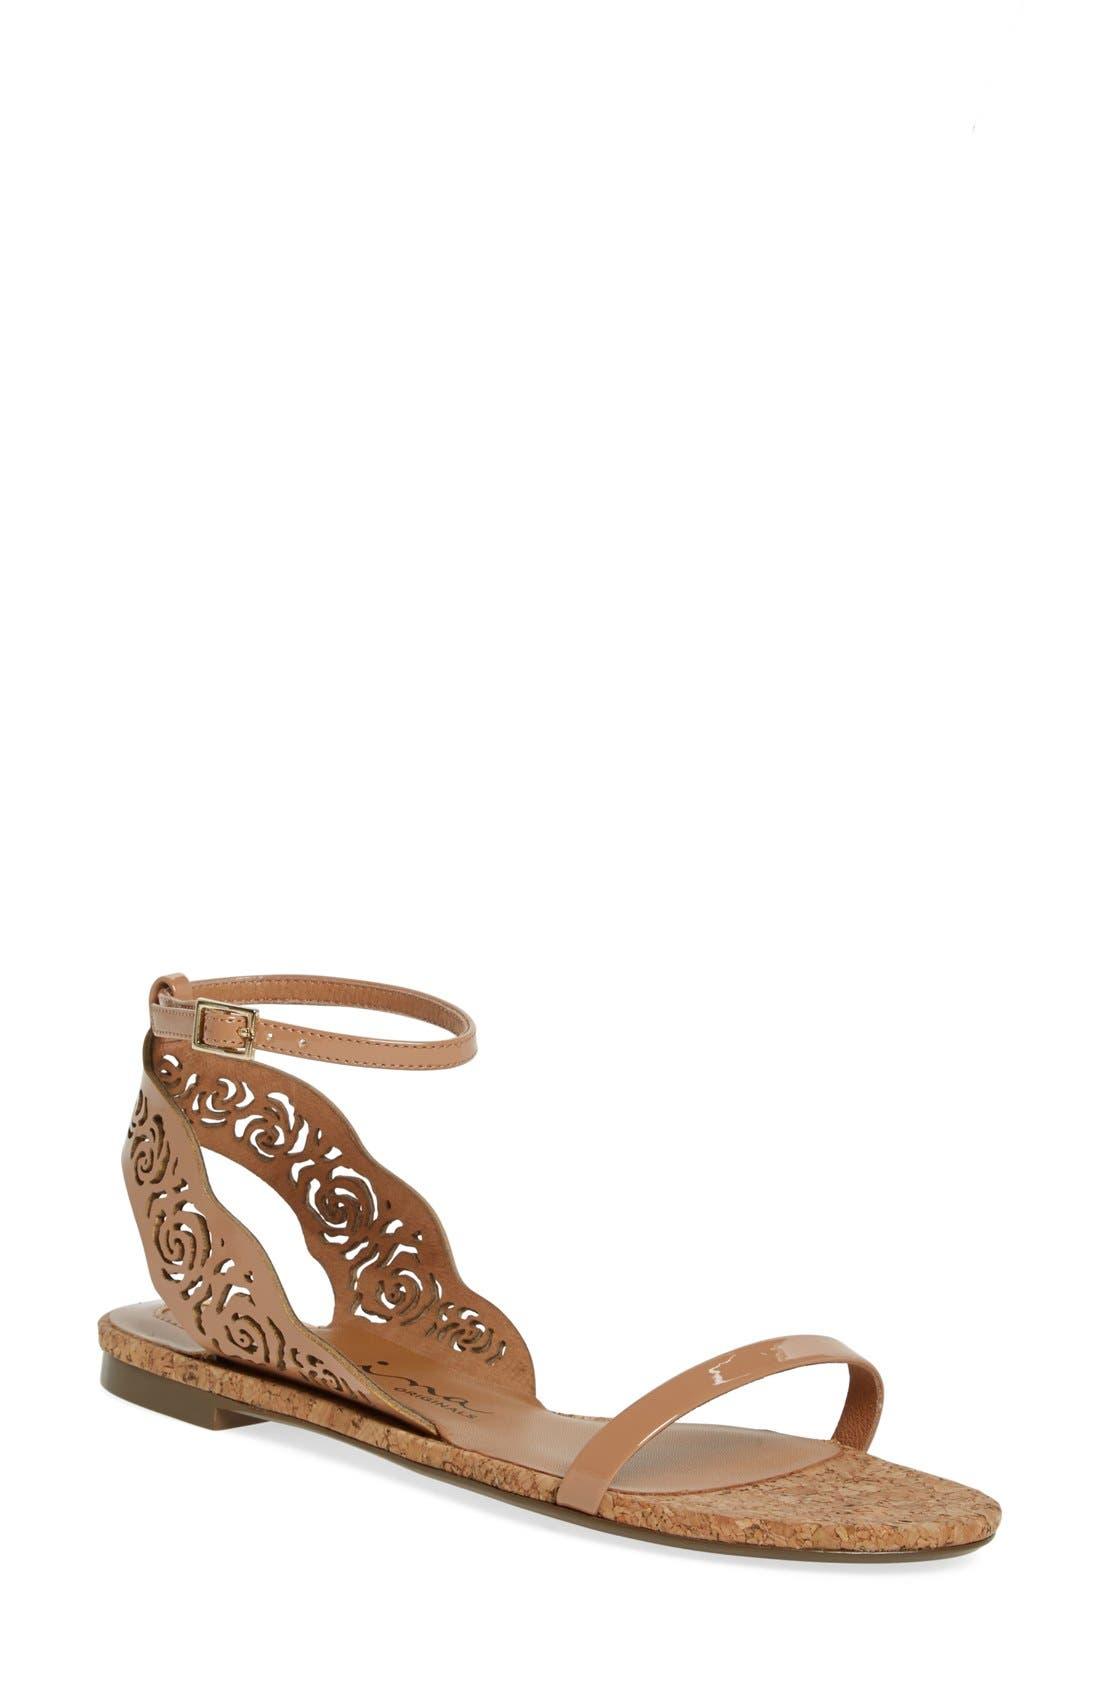 Main Image - Nina Originals 'Shiloh' Ankle Strap Sandal (Women)